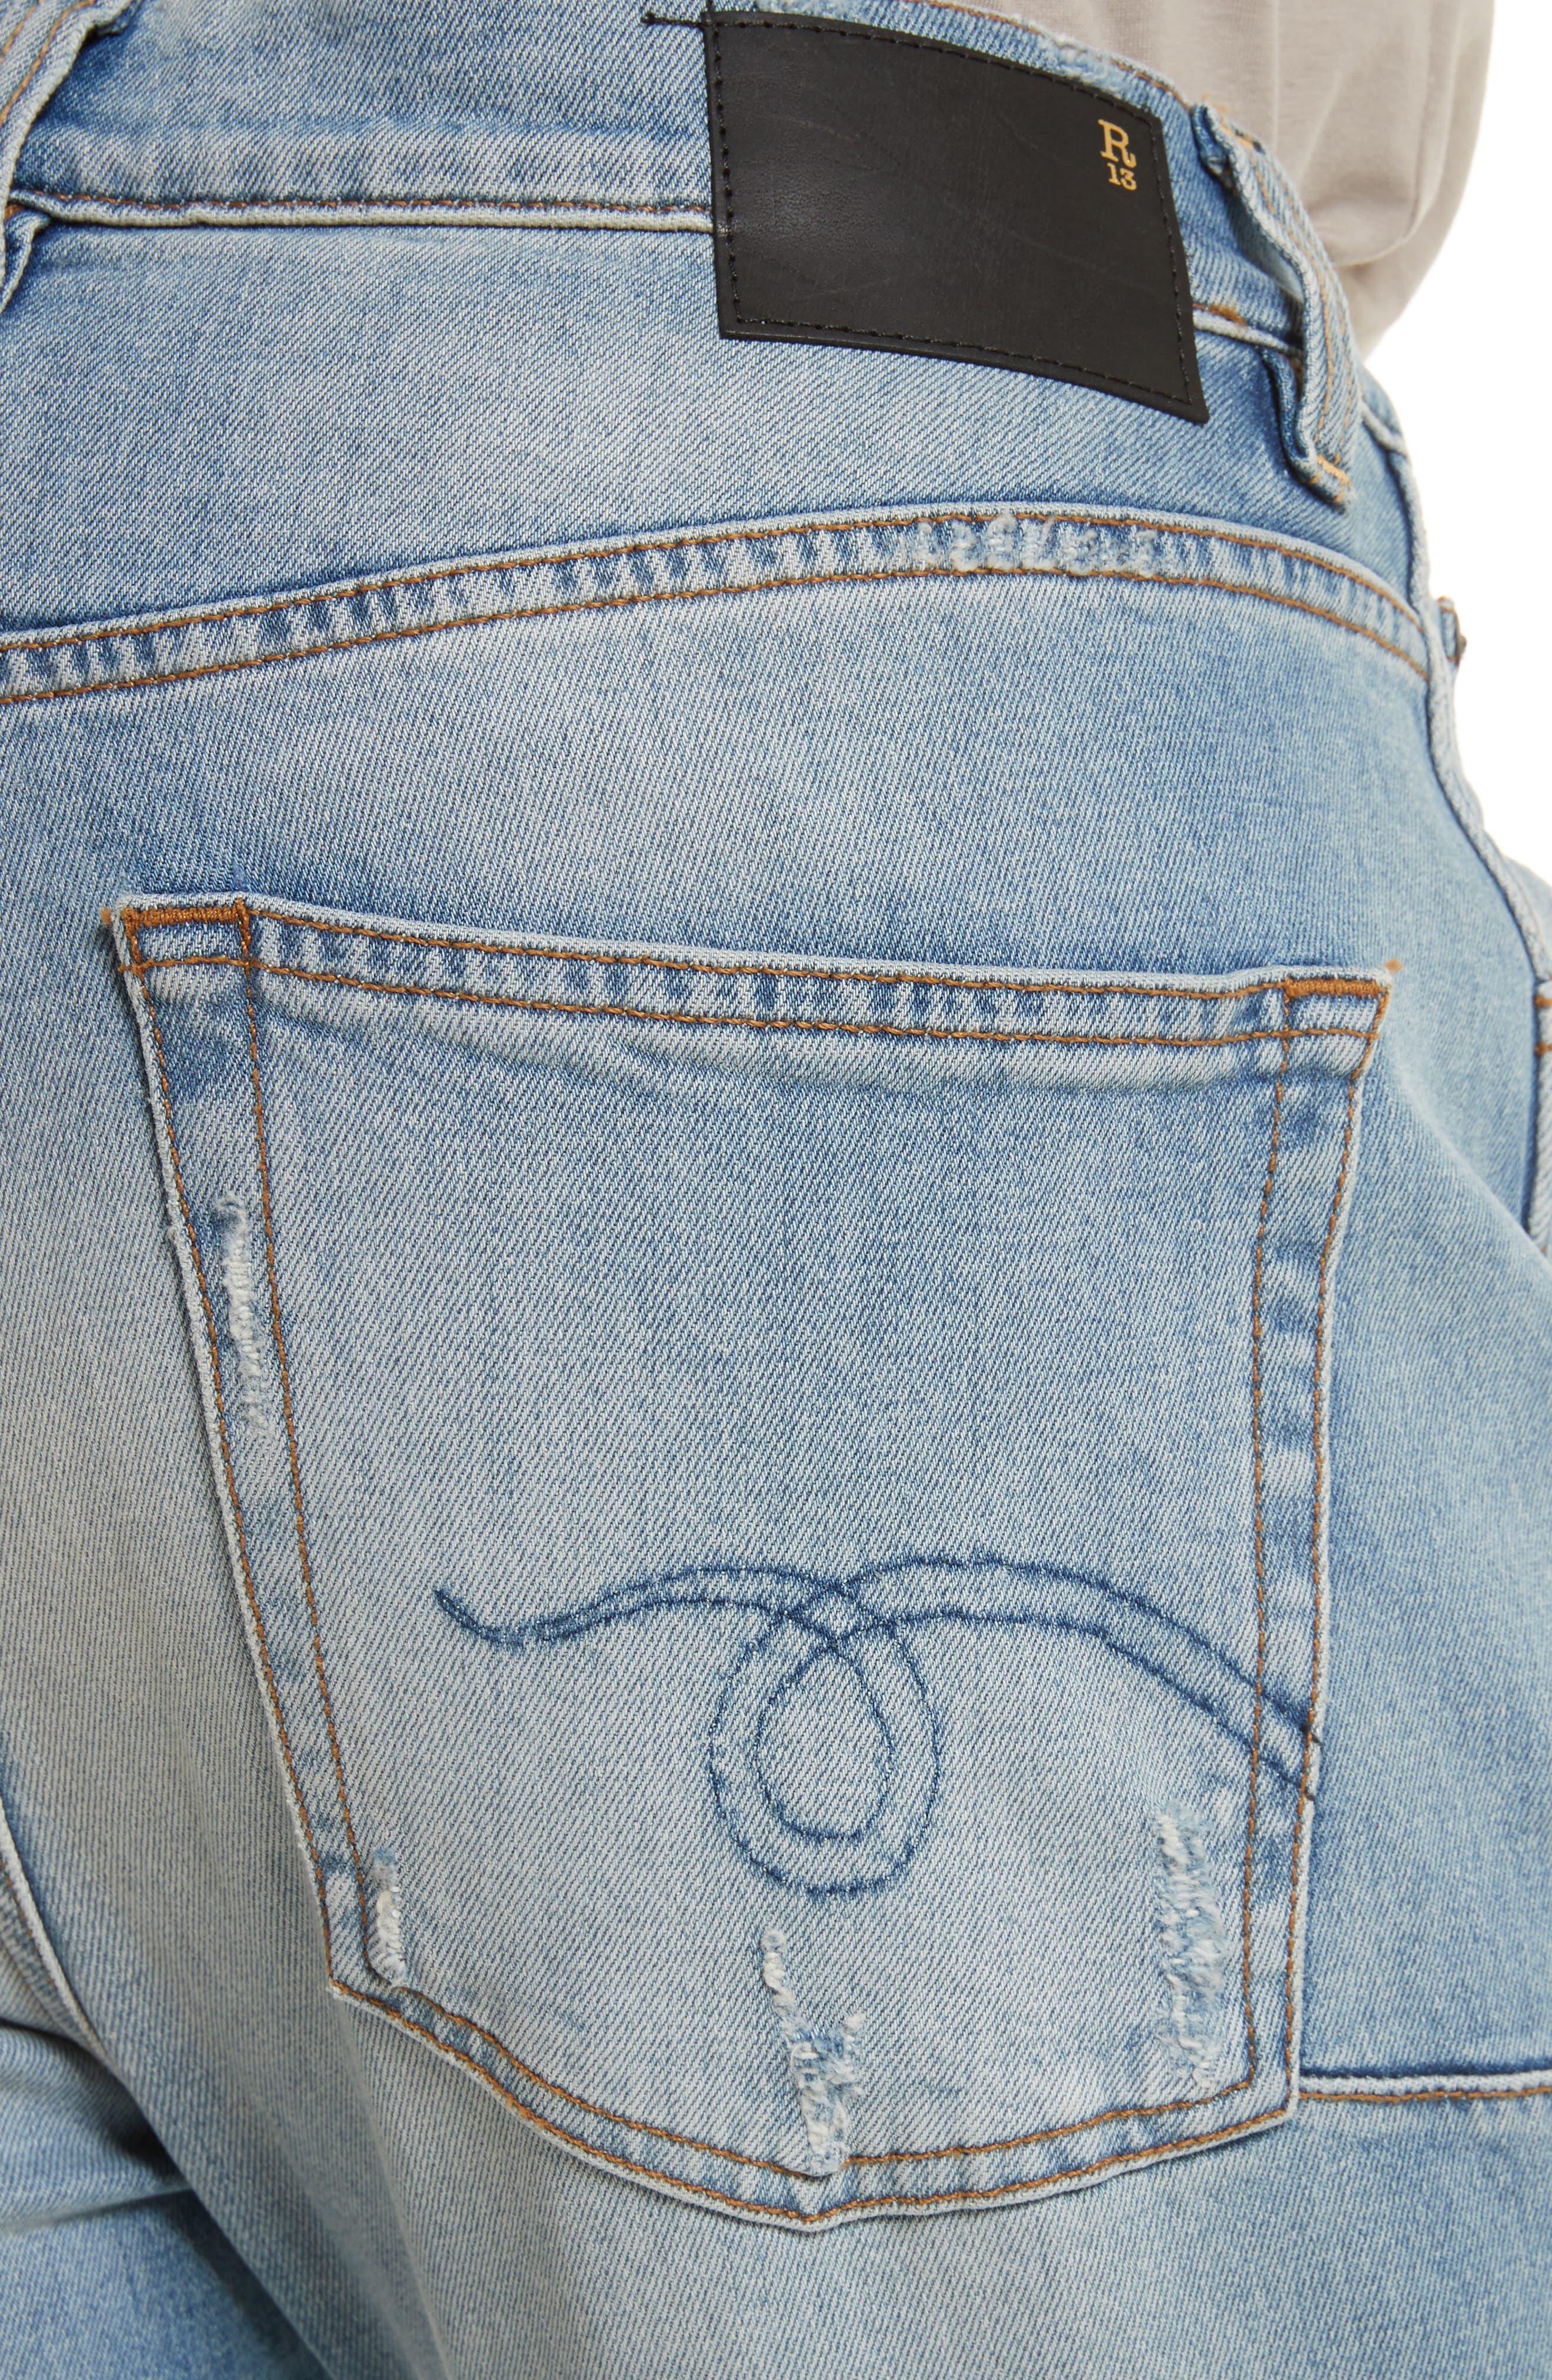 Deacon Skate Skinny Fit Jeans,                             Alternate thumbnail 4, color,                             400